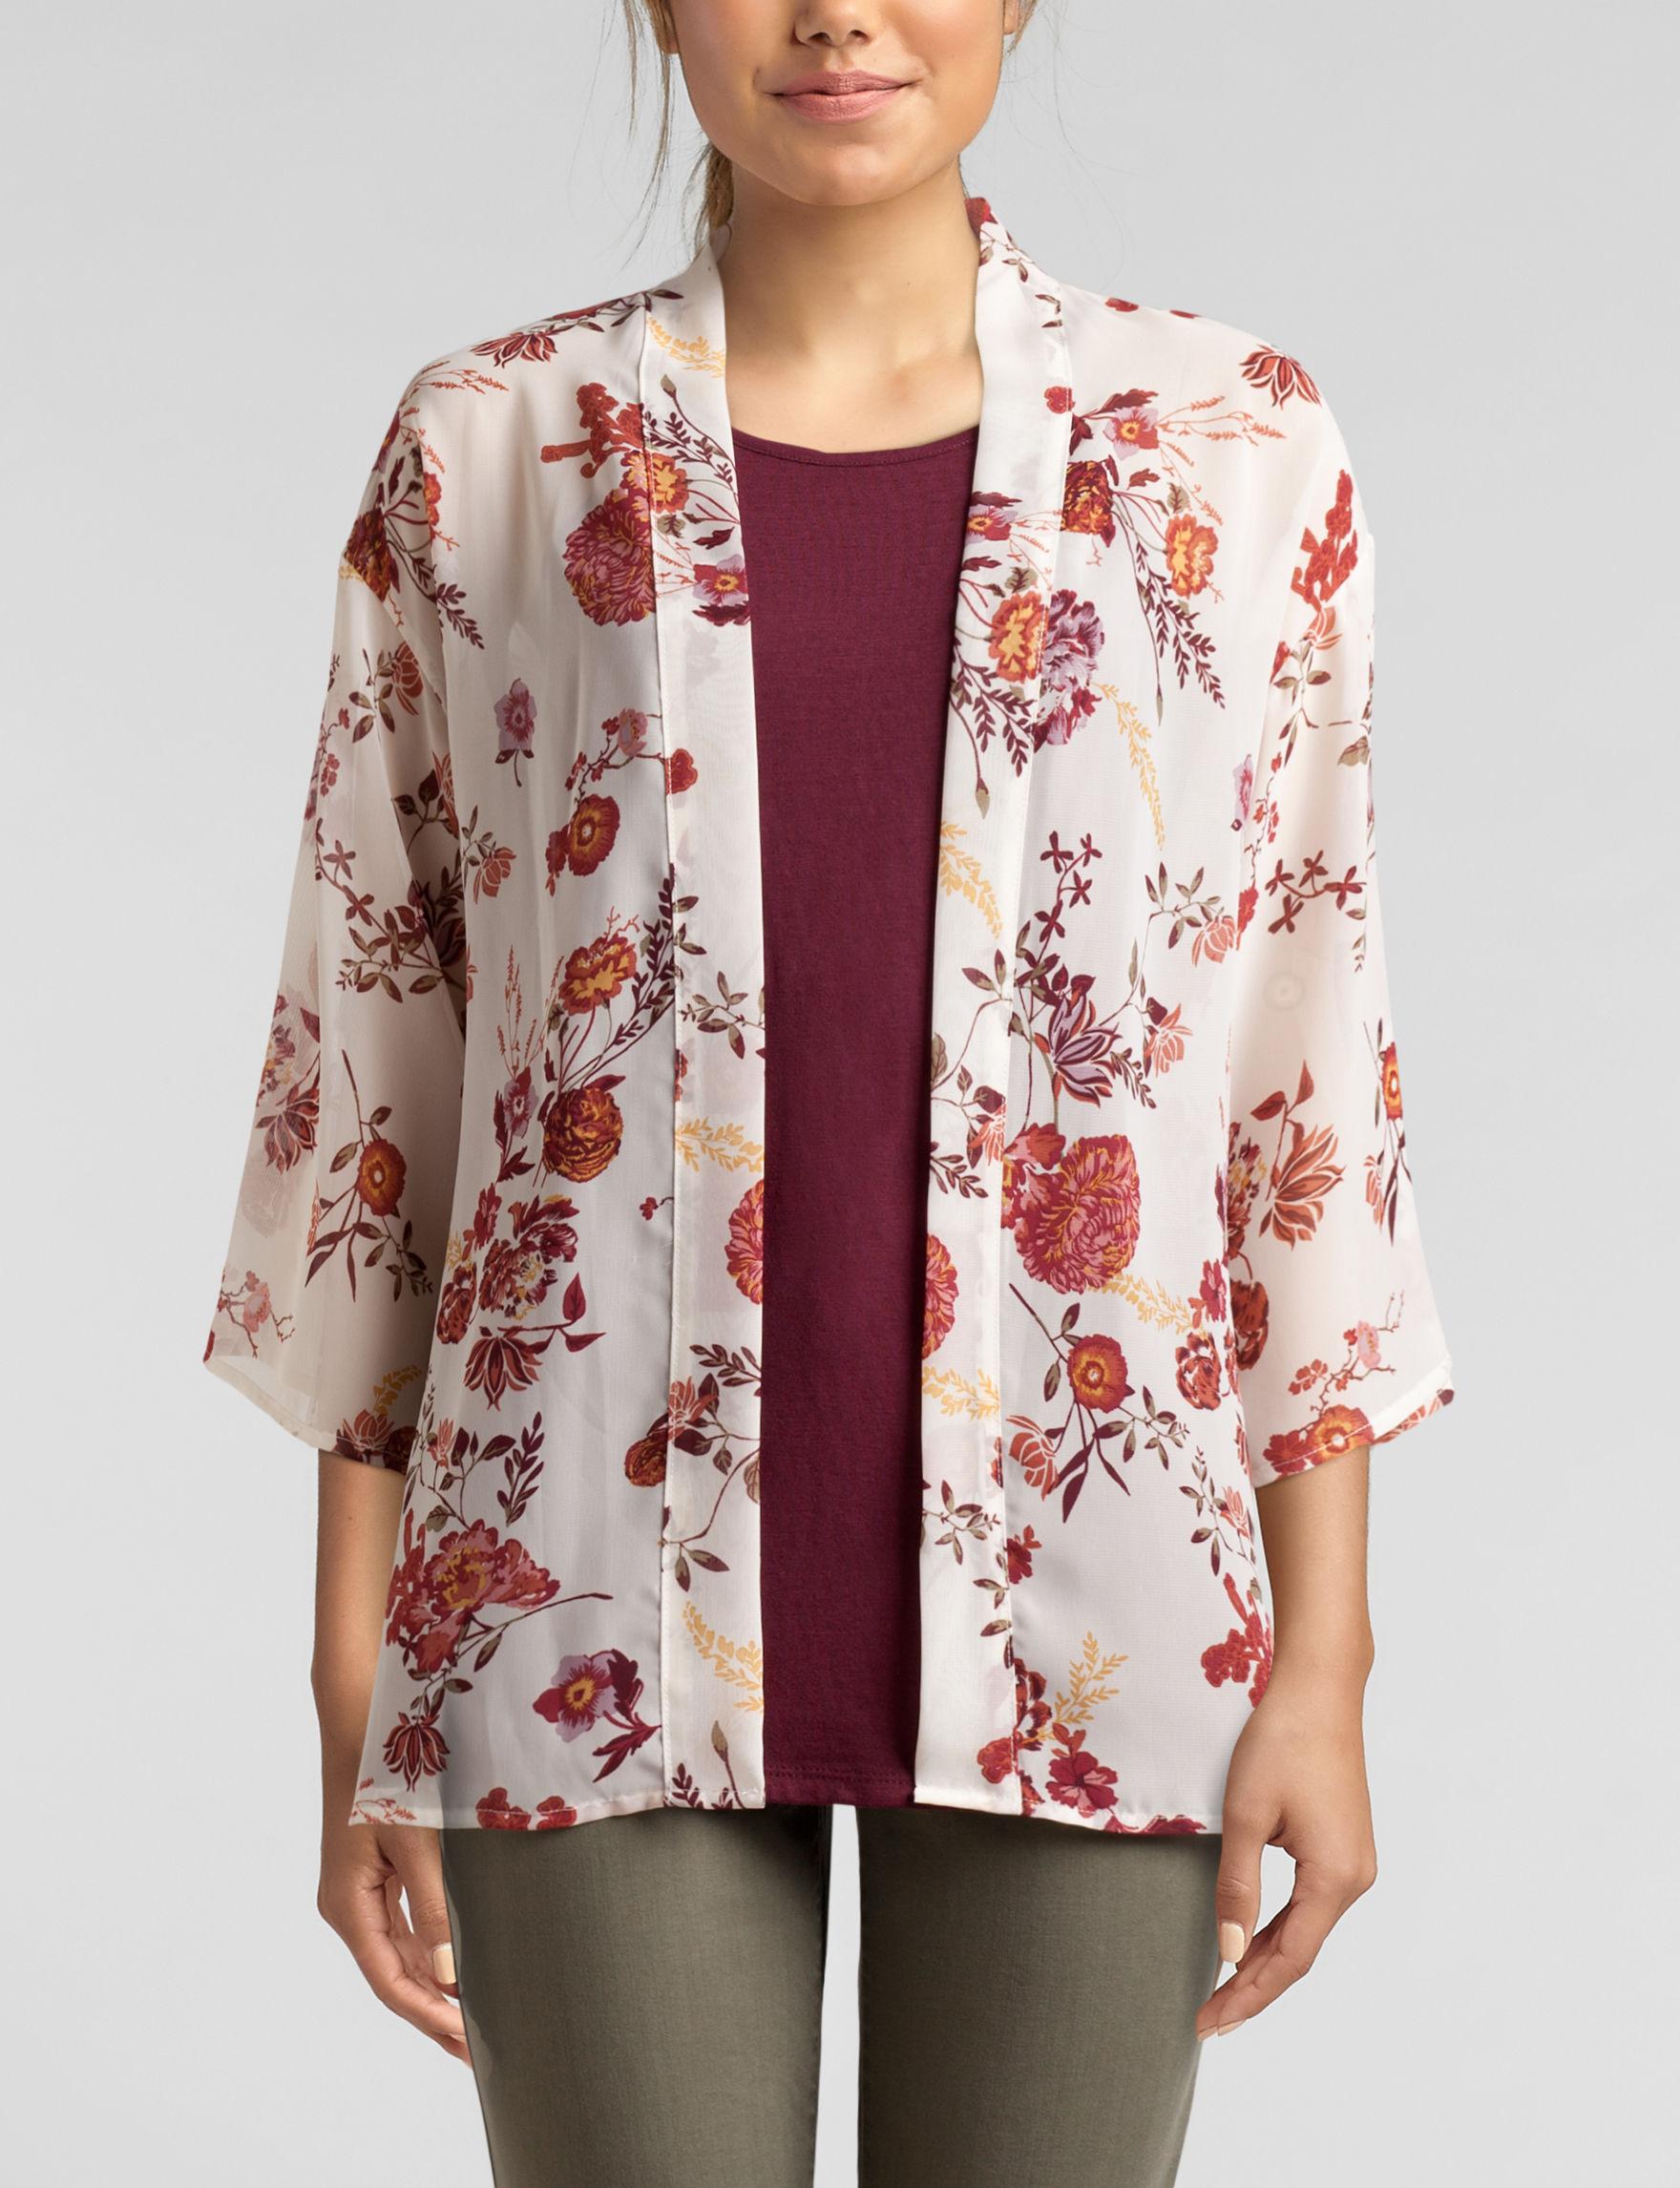 WallFlower Ivory Floral Kimonos & Toppers